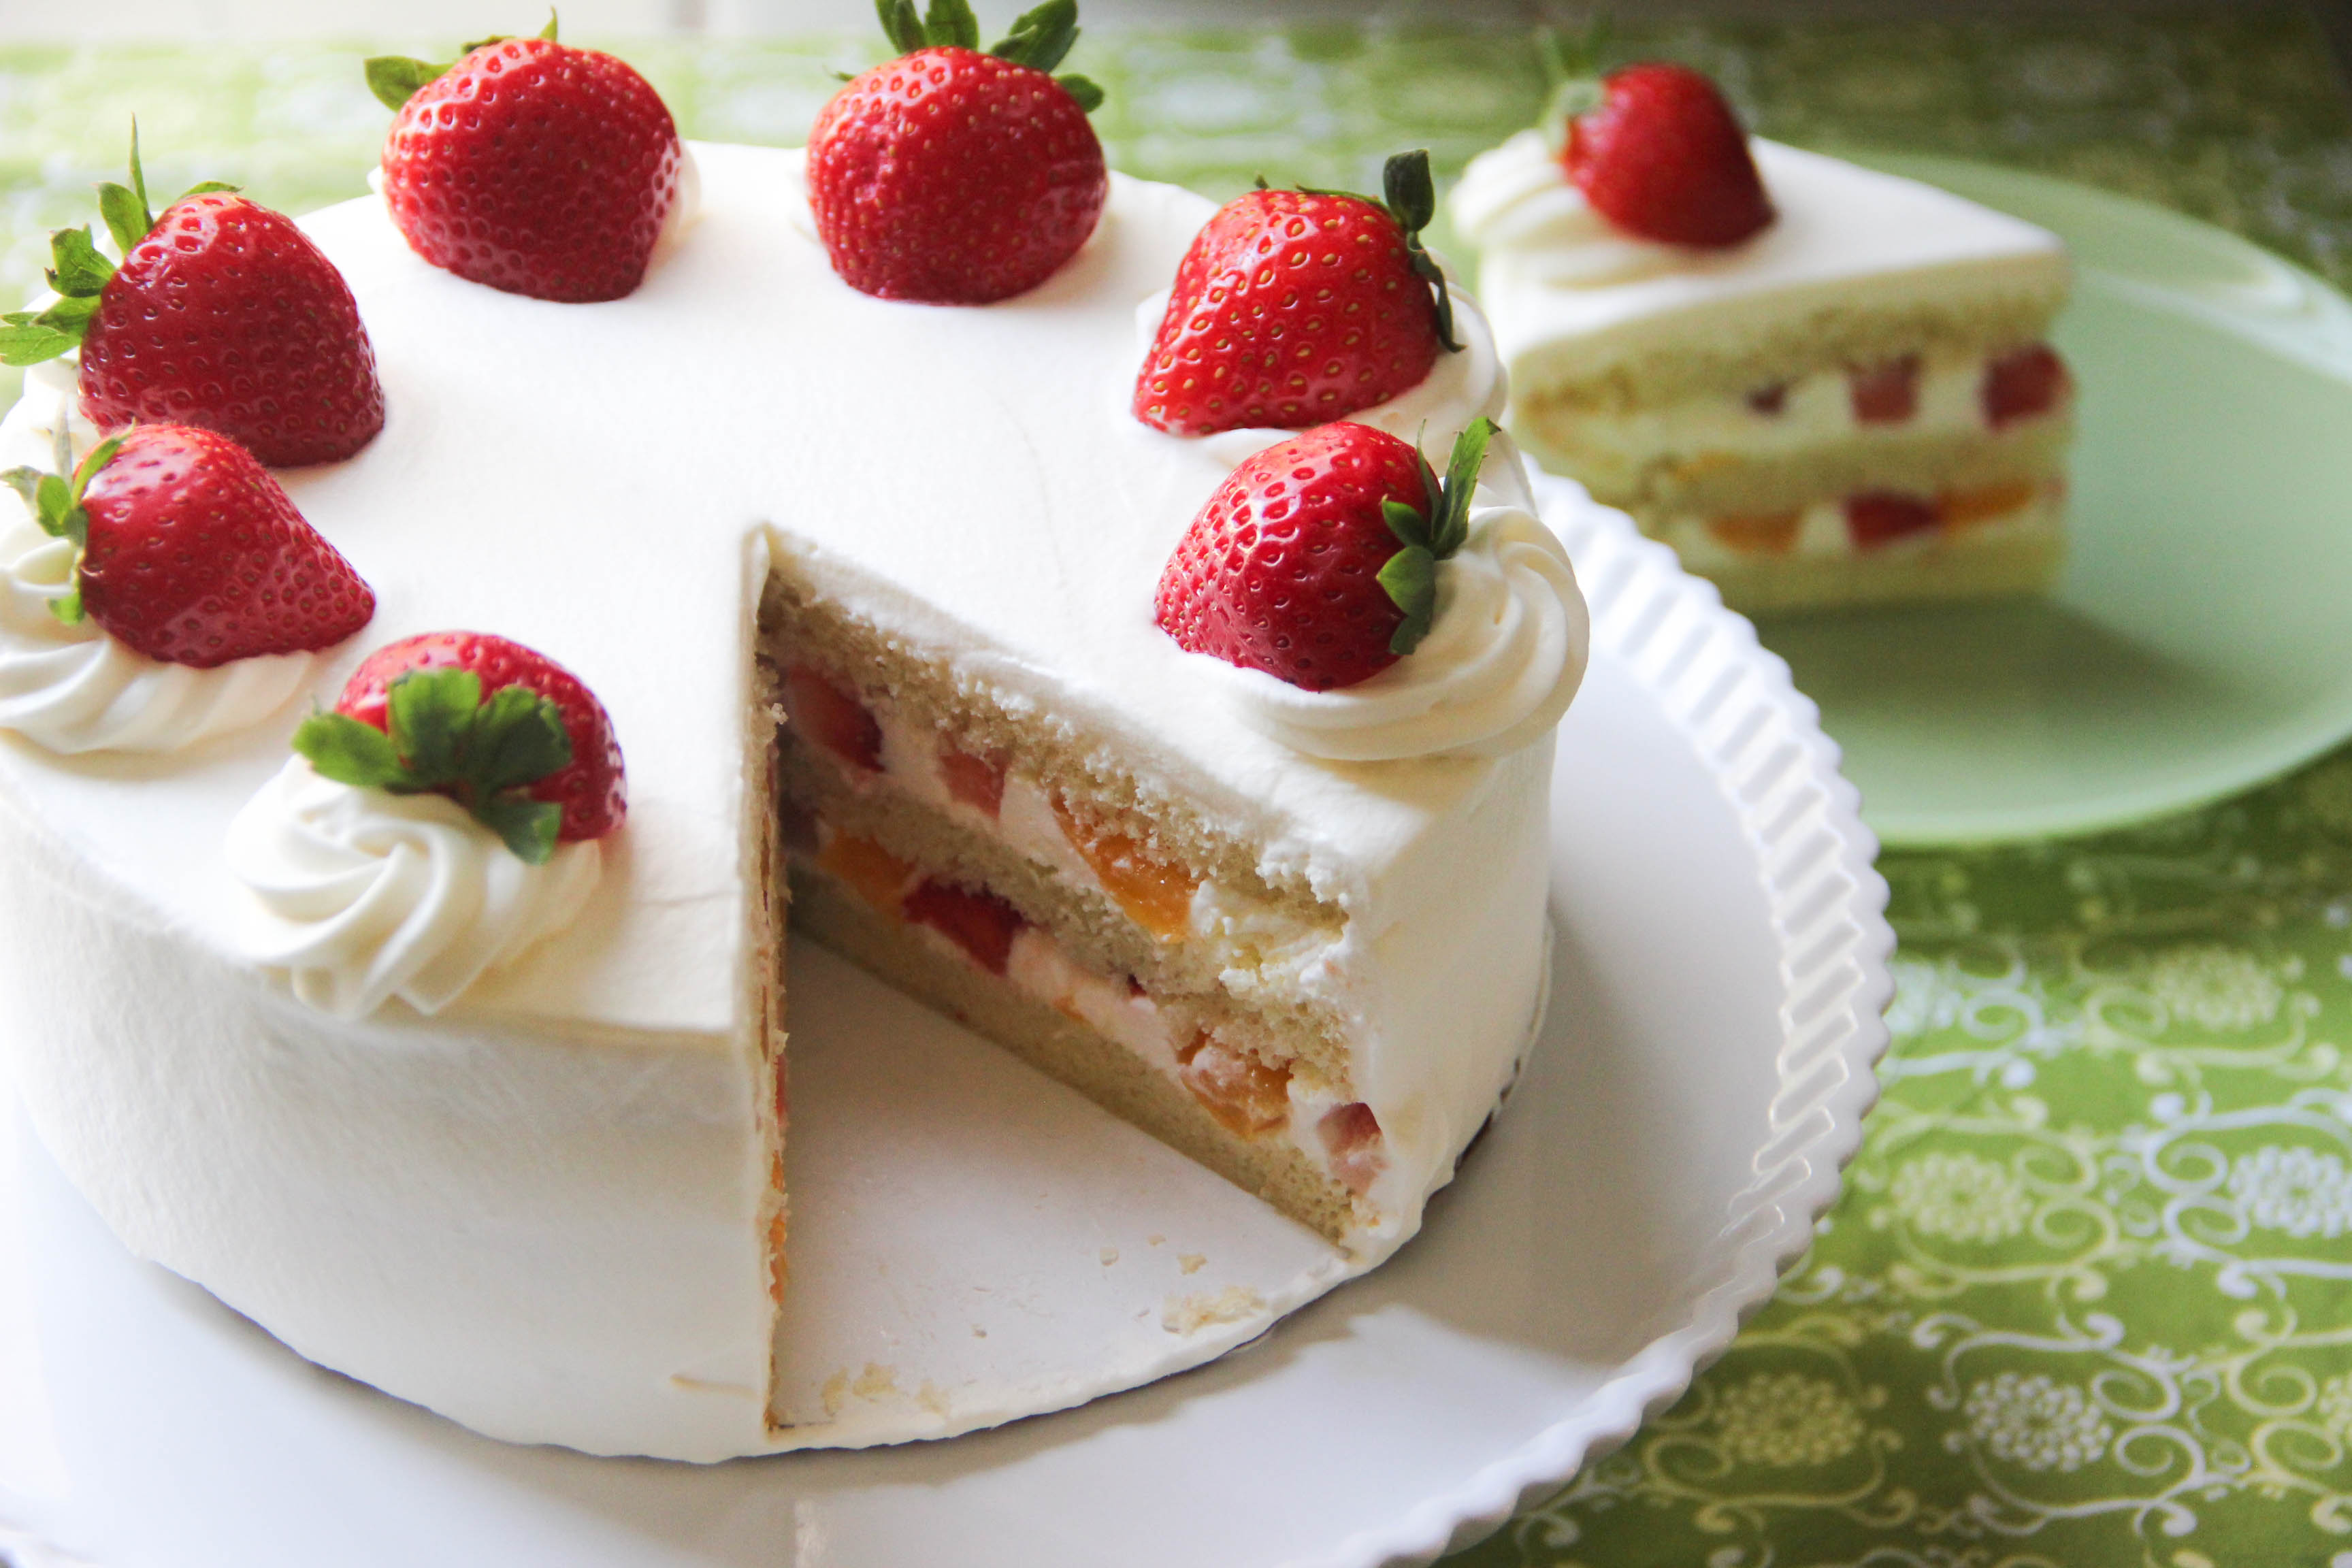 Popular Dessert: Strawberry Shortcake